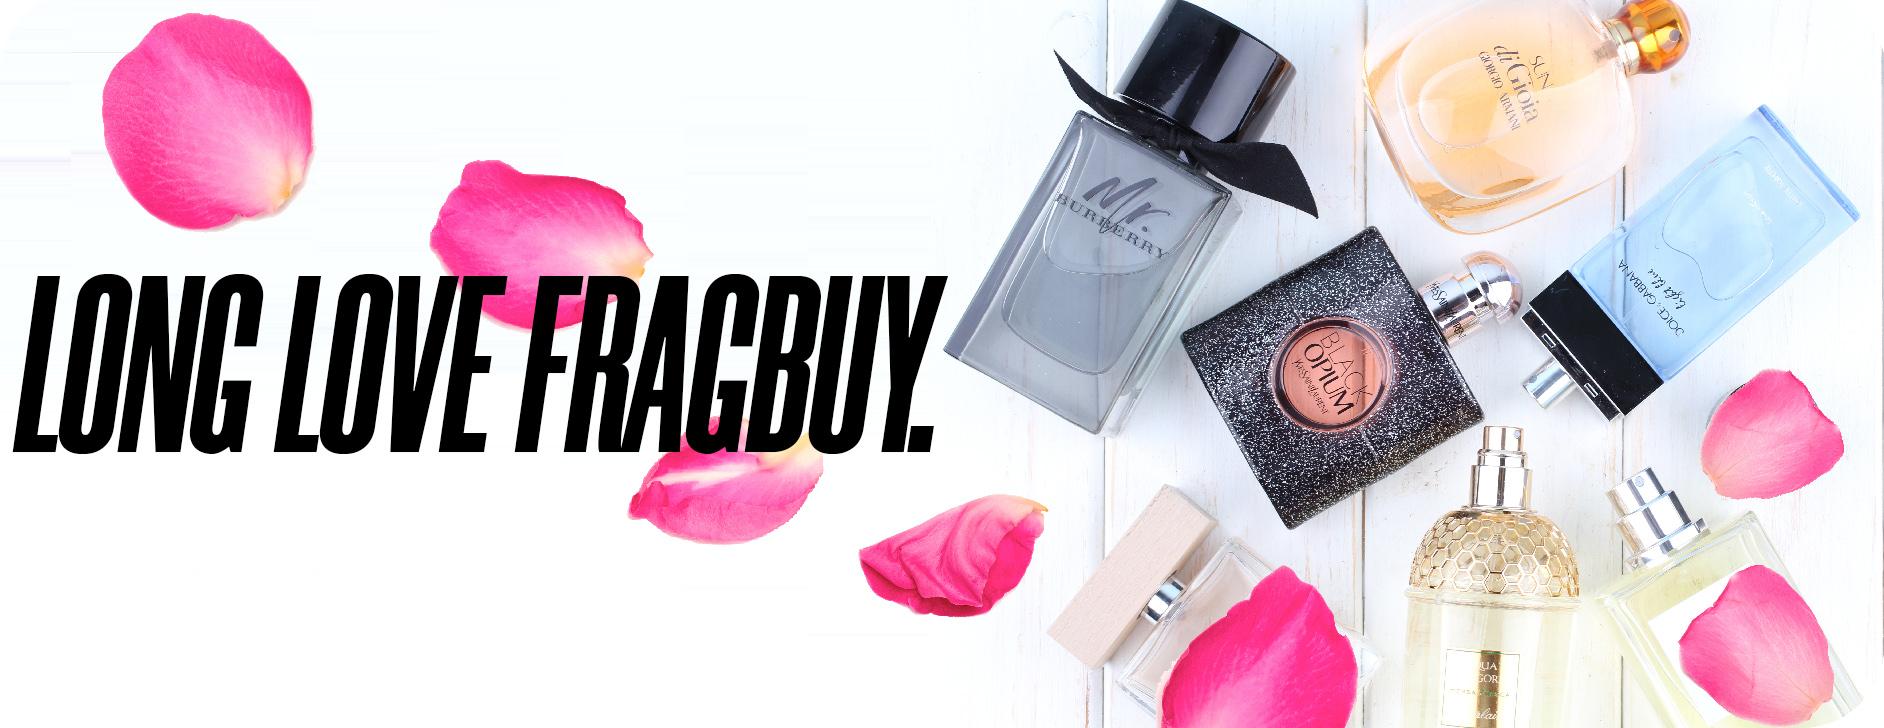 Full Perfume Cologne Catalogue at Fragrancebuy